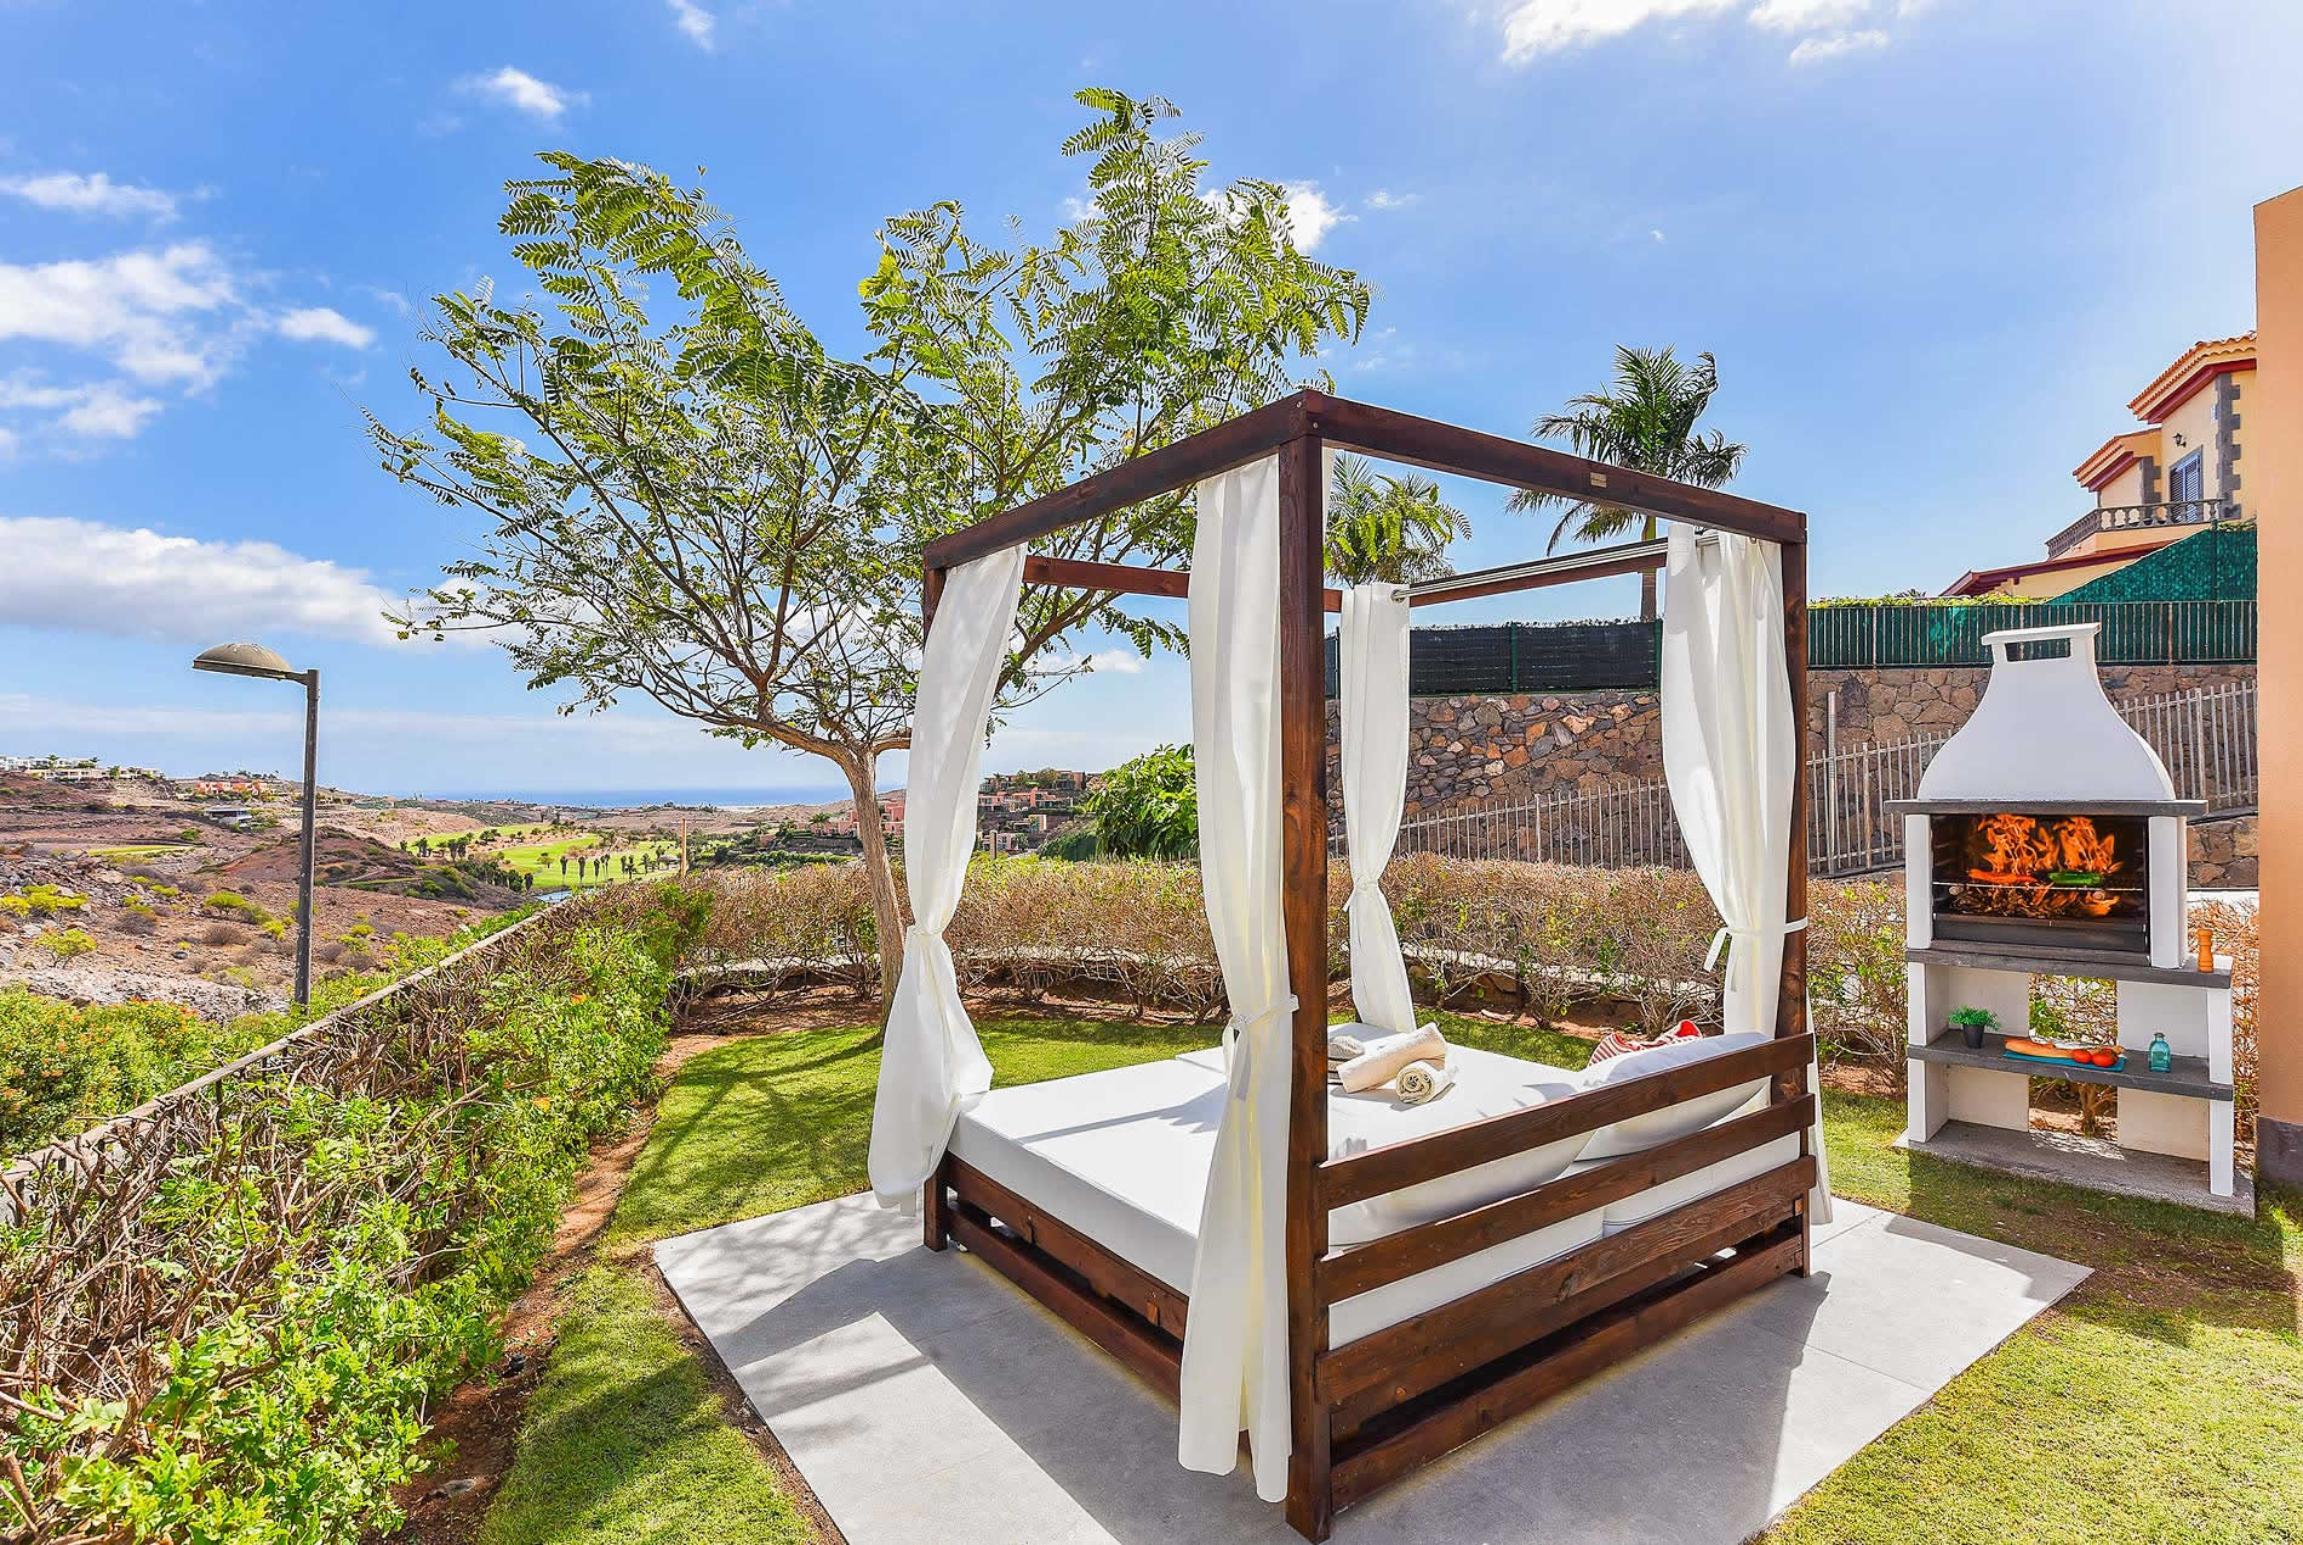 Holiday house Par 4 Villa 24 (2654009), Maspalomas, Gran Canaria, Canary Islands, Spain, picture 8